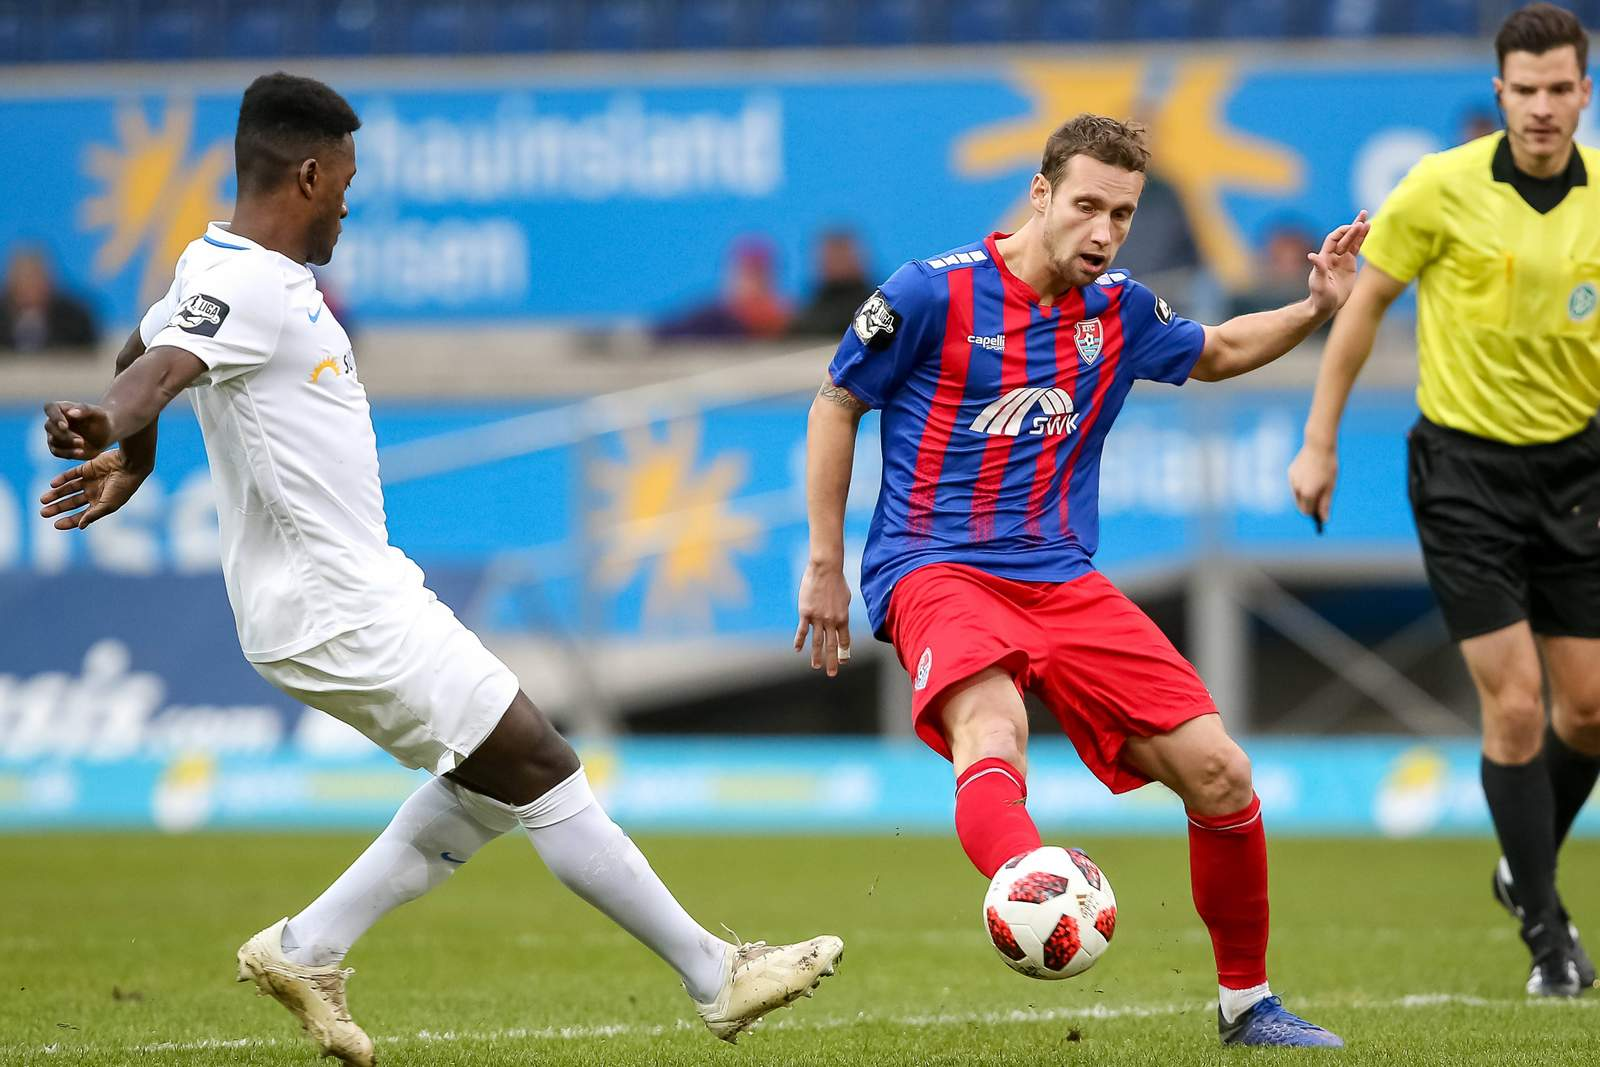 Merveille Biankadi von Hansa Rostock gegen Manuel Konrad vom KFC Uerdingen.